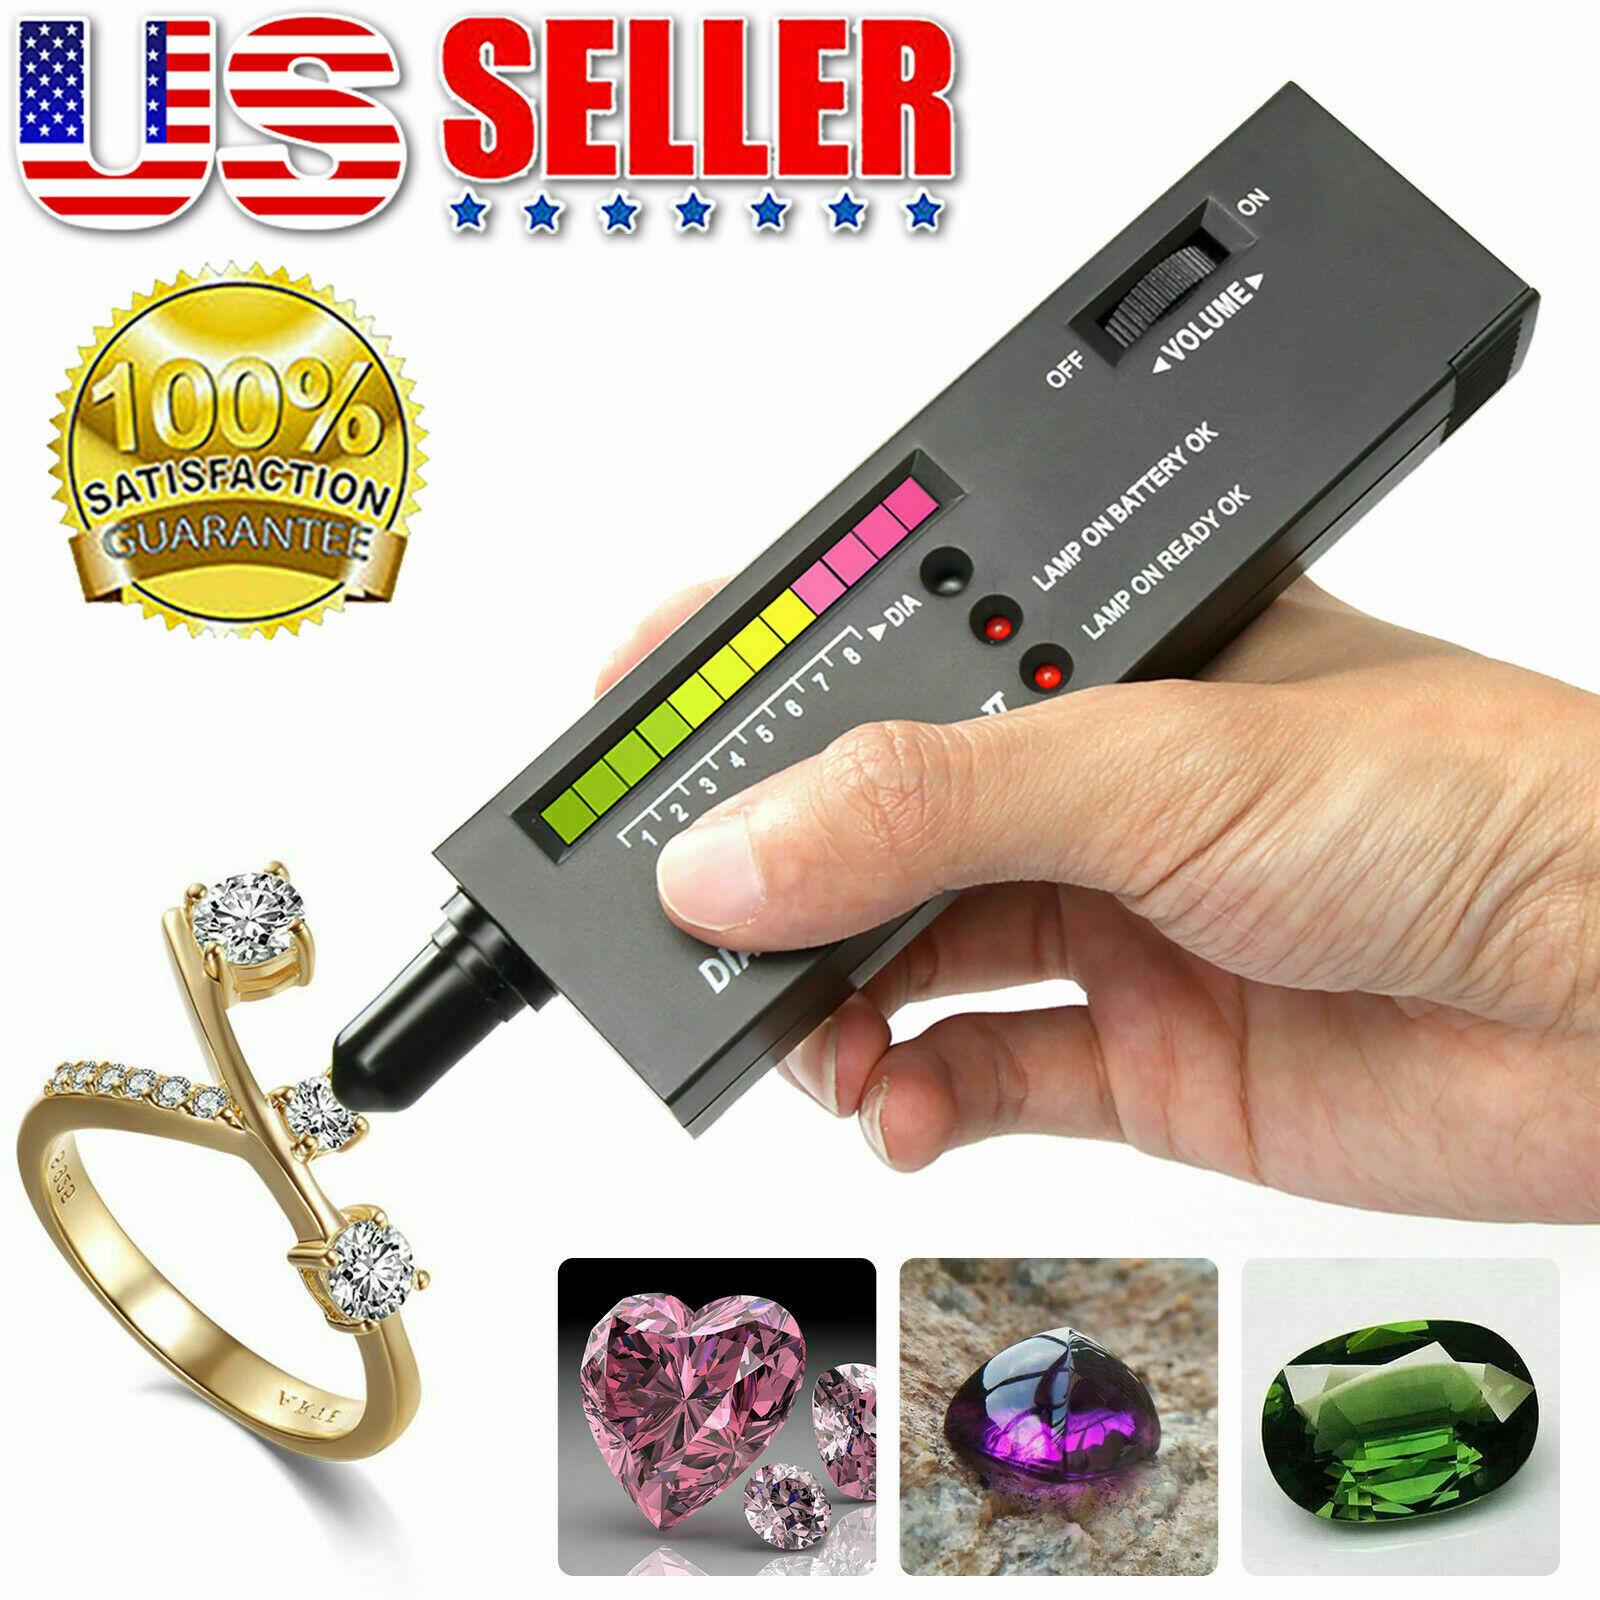 High Accuracy Professional Diamond Tester Gemstone Selector ll Jeweler Tool Kit Jewelry & Watches